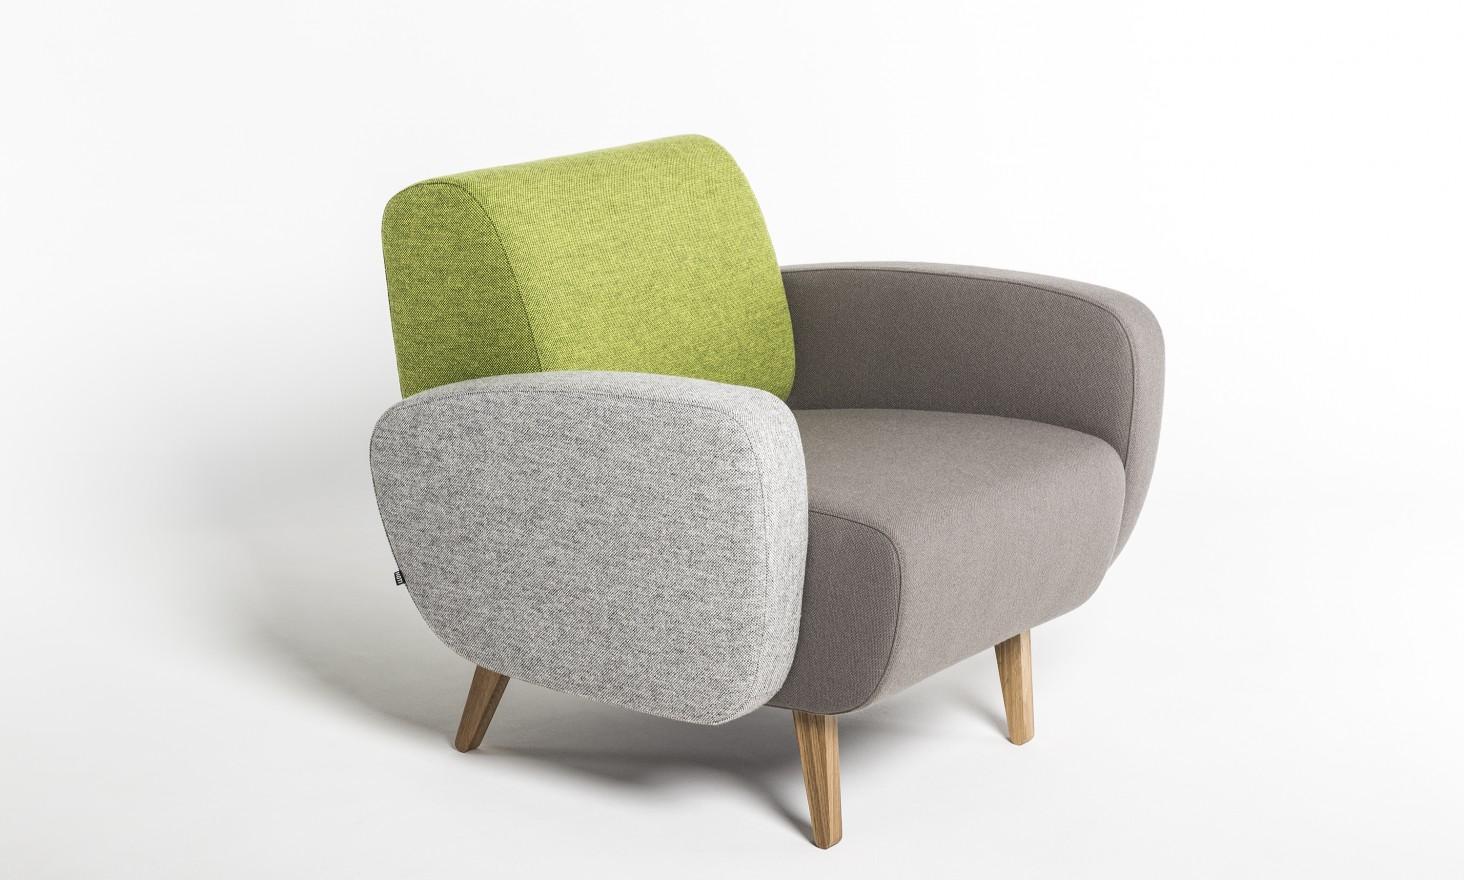 TEDDY_BEAR_packshot_armchair 2